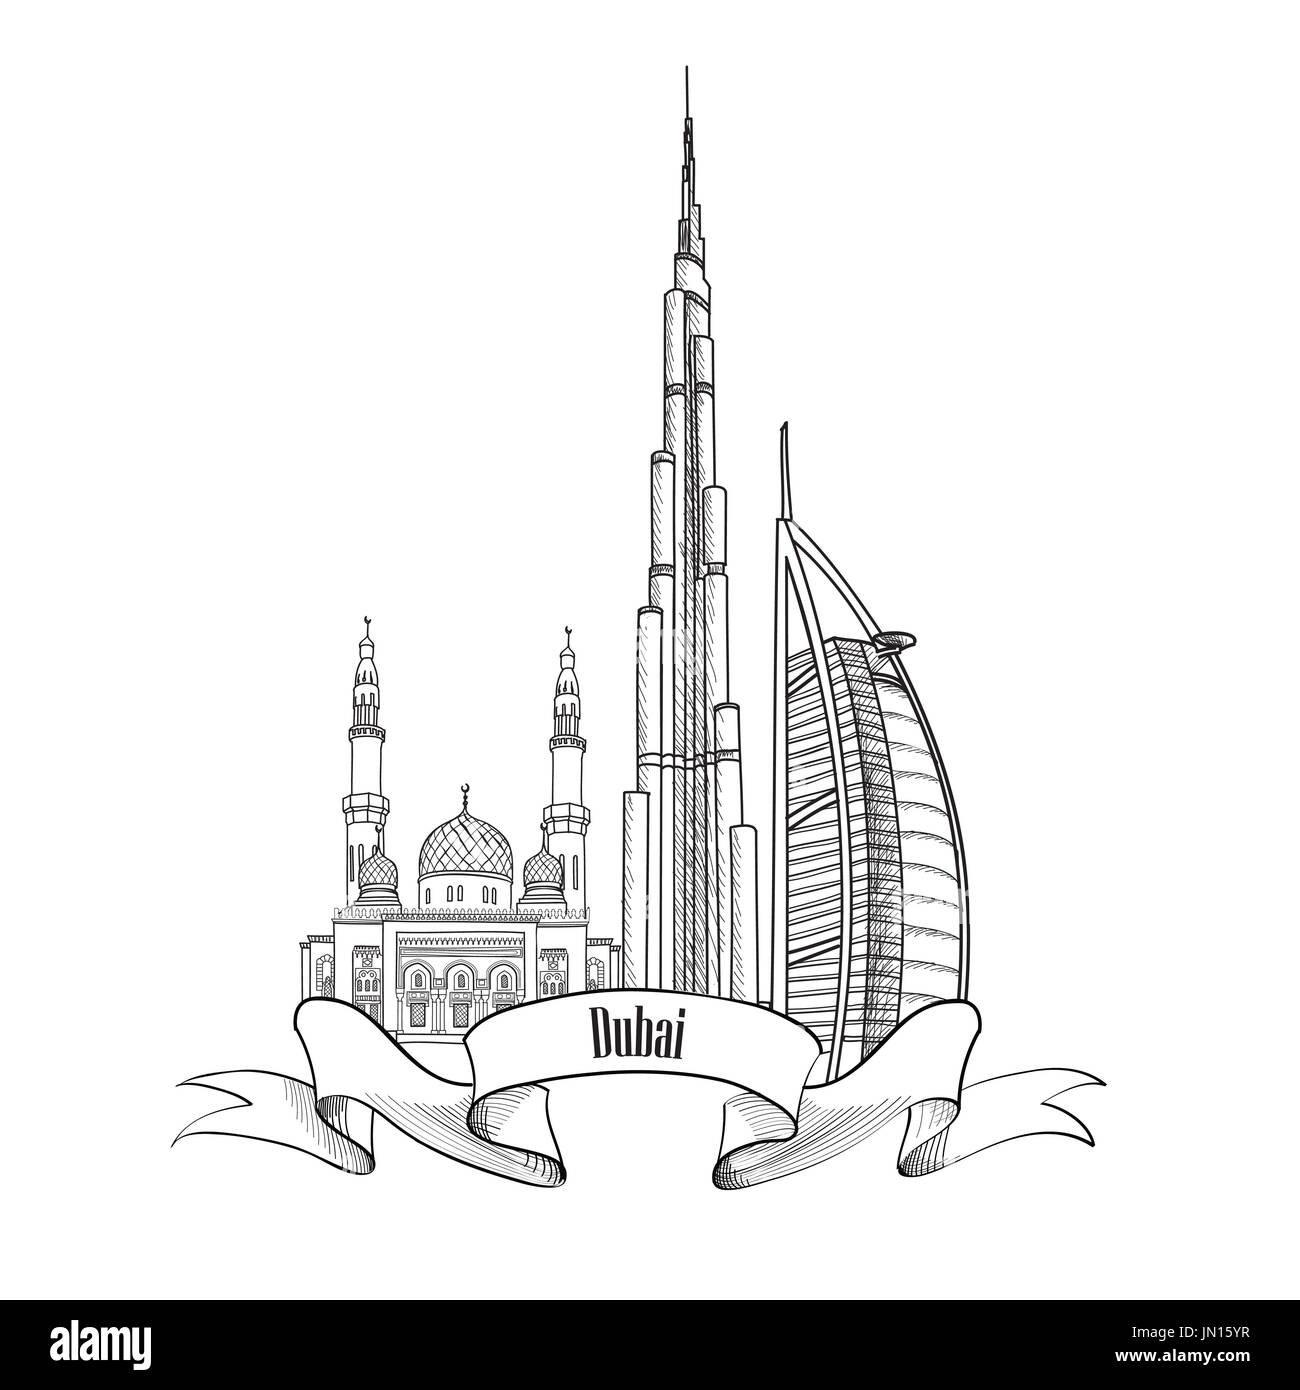 Dubai skyline cut out stock images pictures alamy travel uae symbol dubai city label stock image buycottarizona Gallery